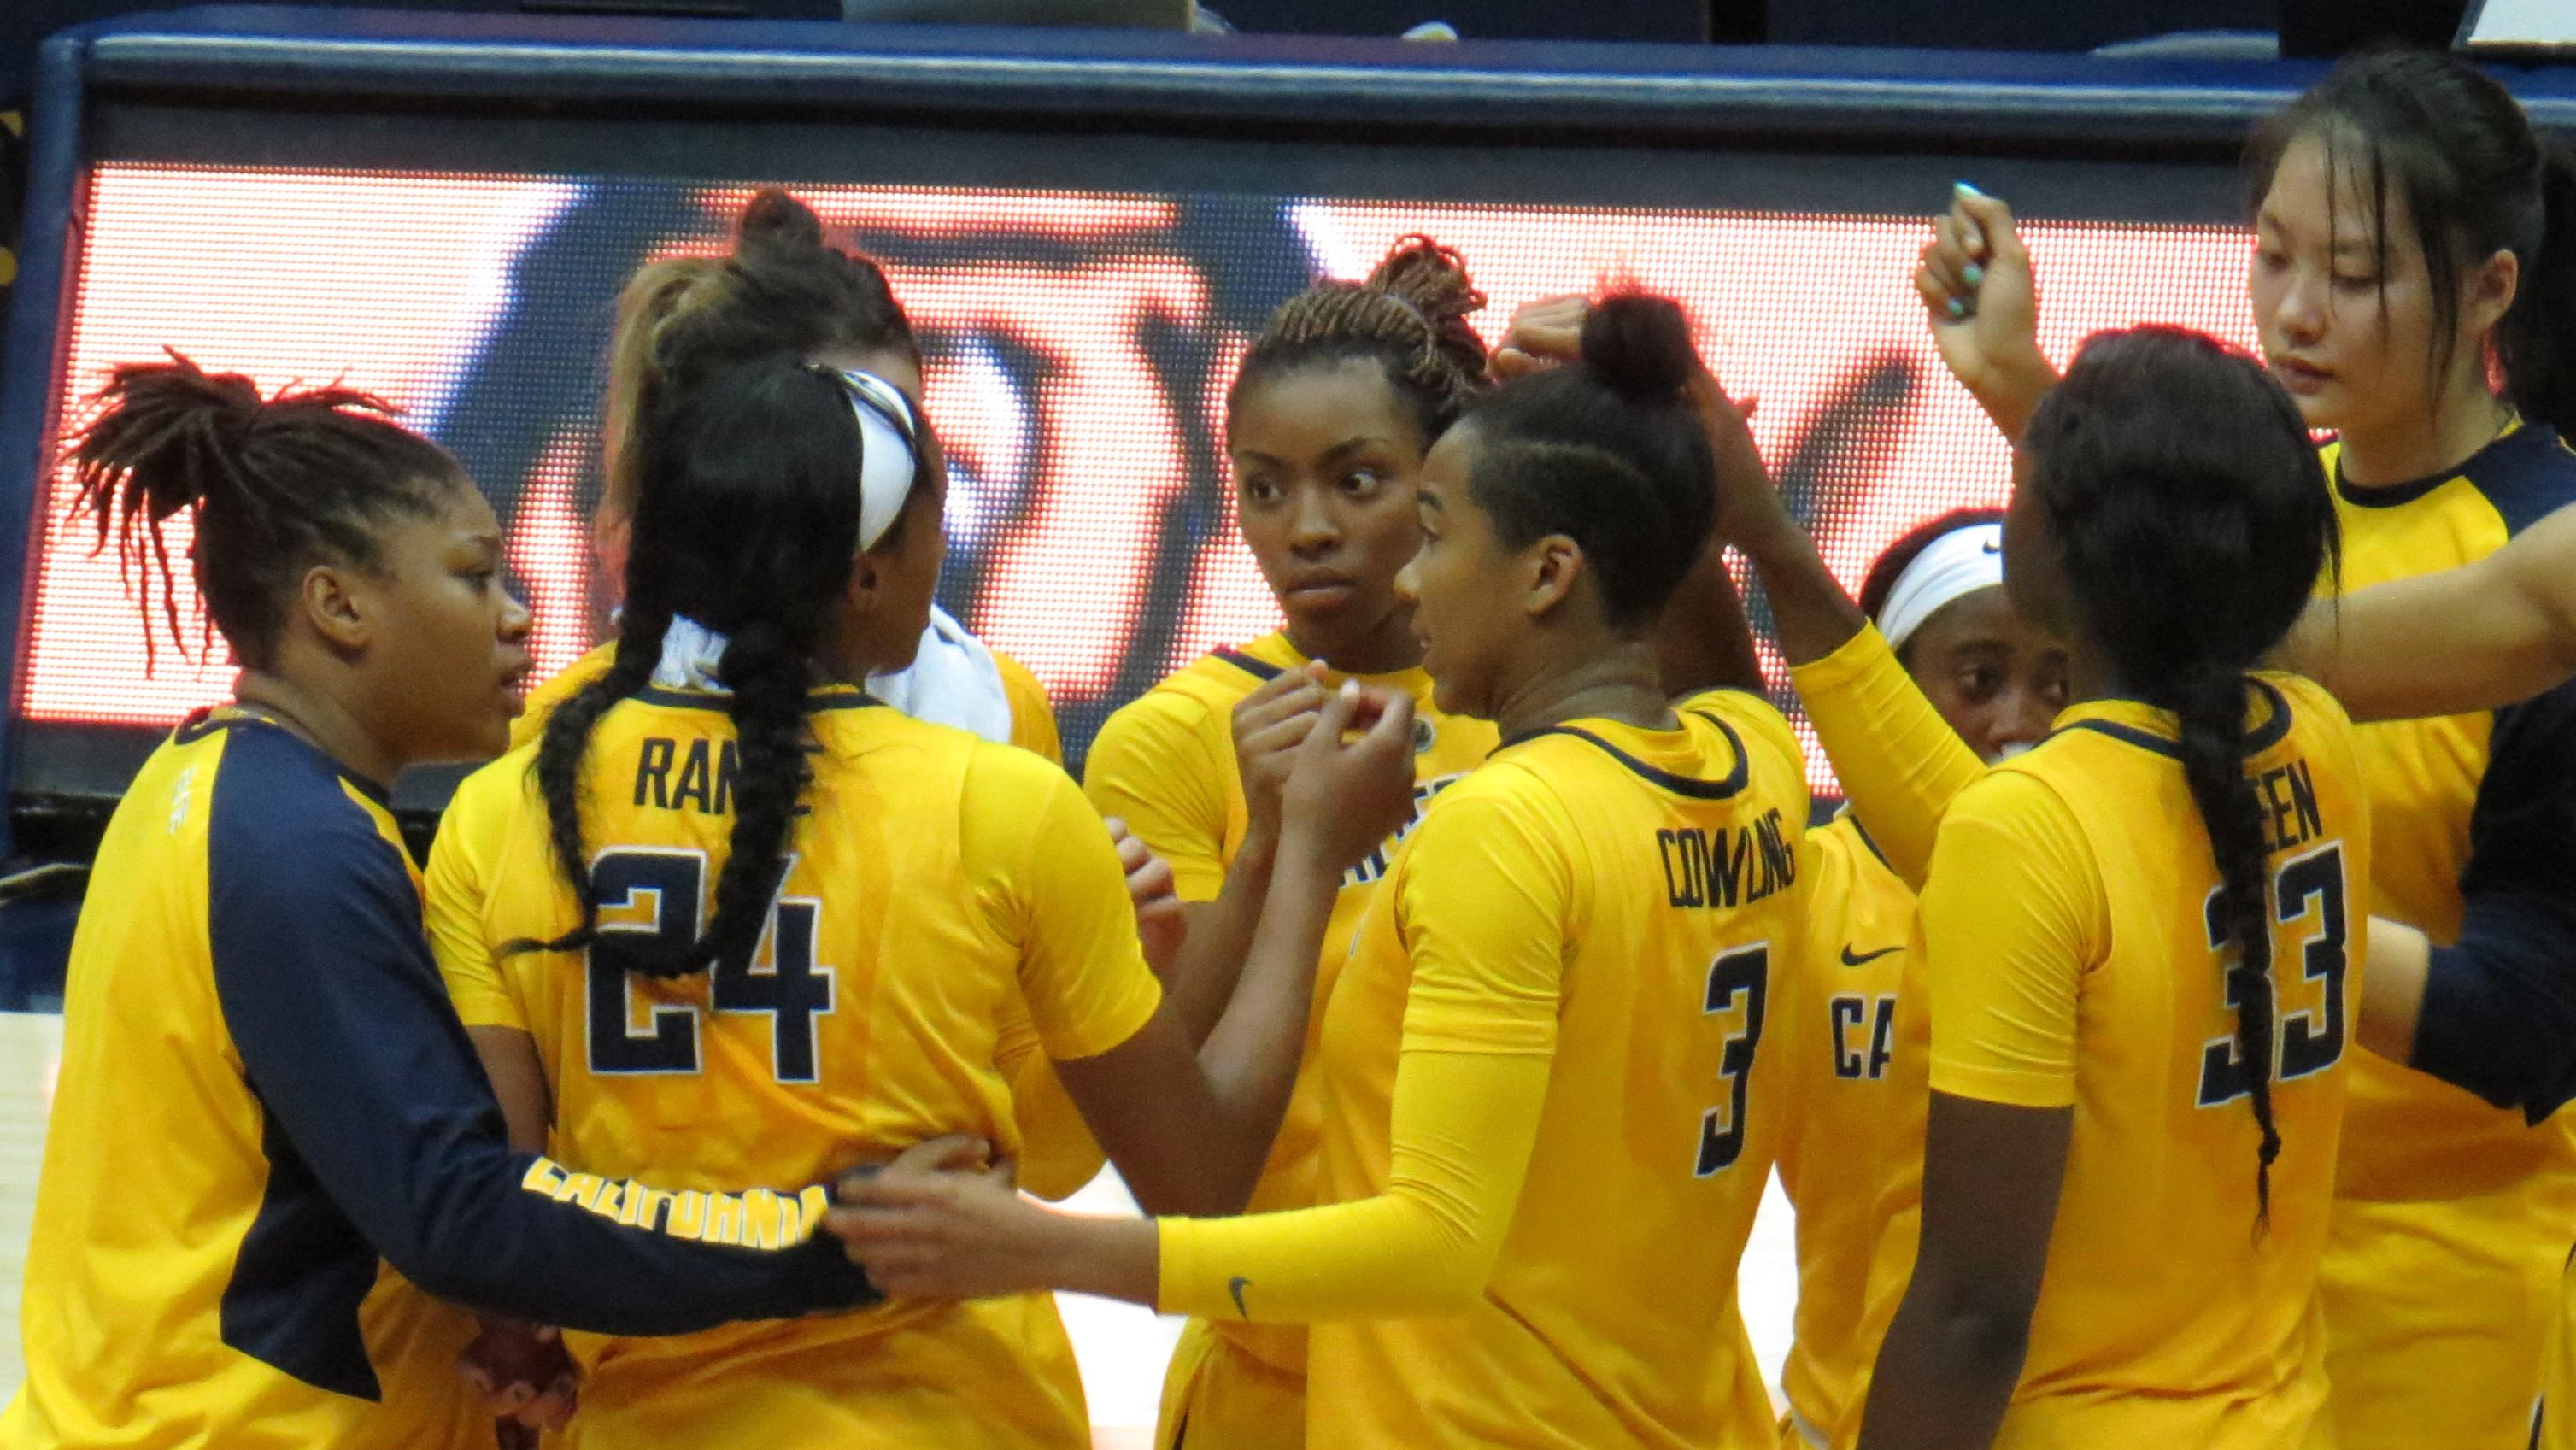 Cal freshmen continue to shine, show composure as Bears down UC Riverside, 64-58